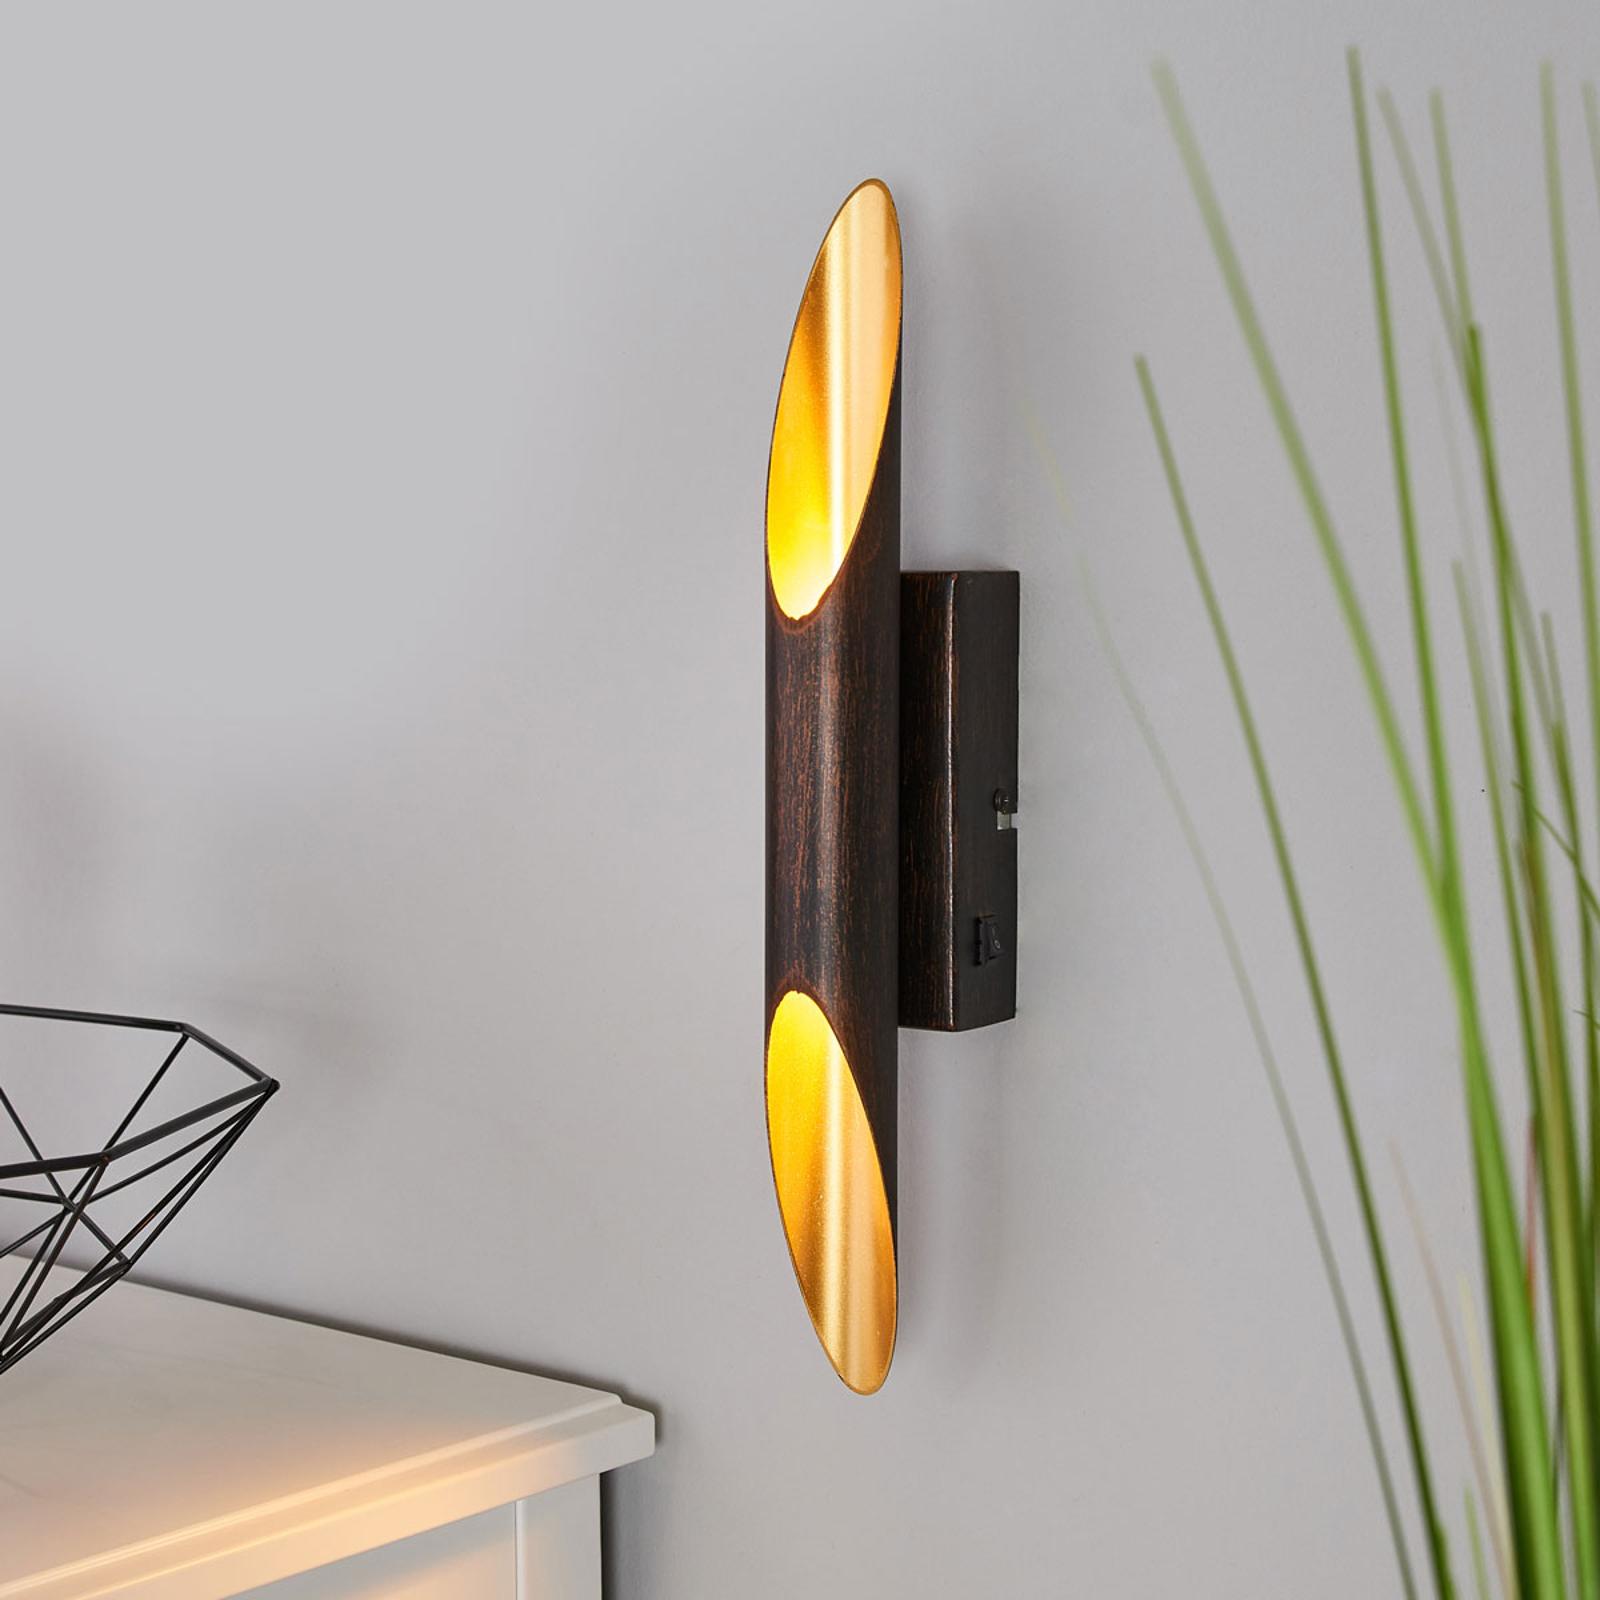 Roestkleurige LED wandlamp Bolero, binnenin goud